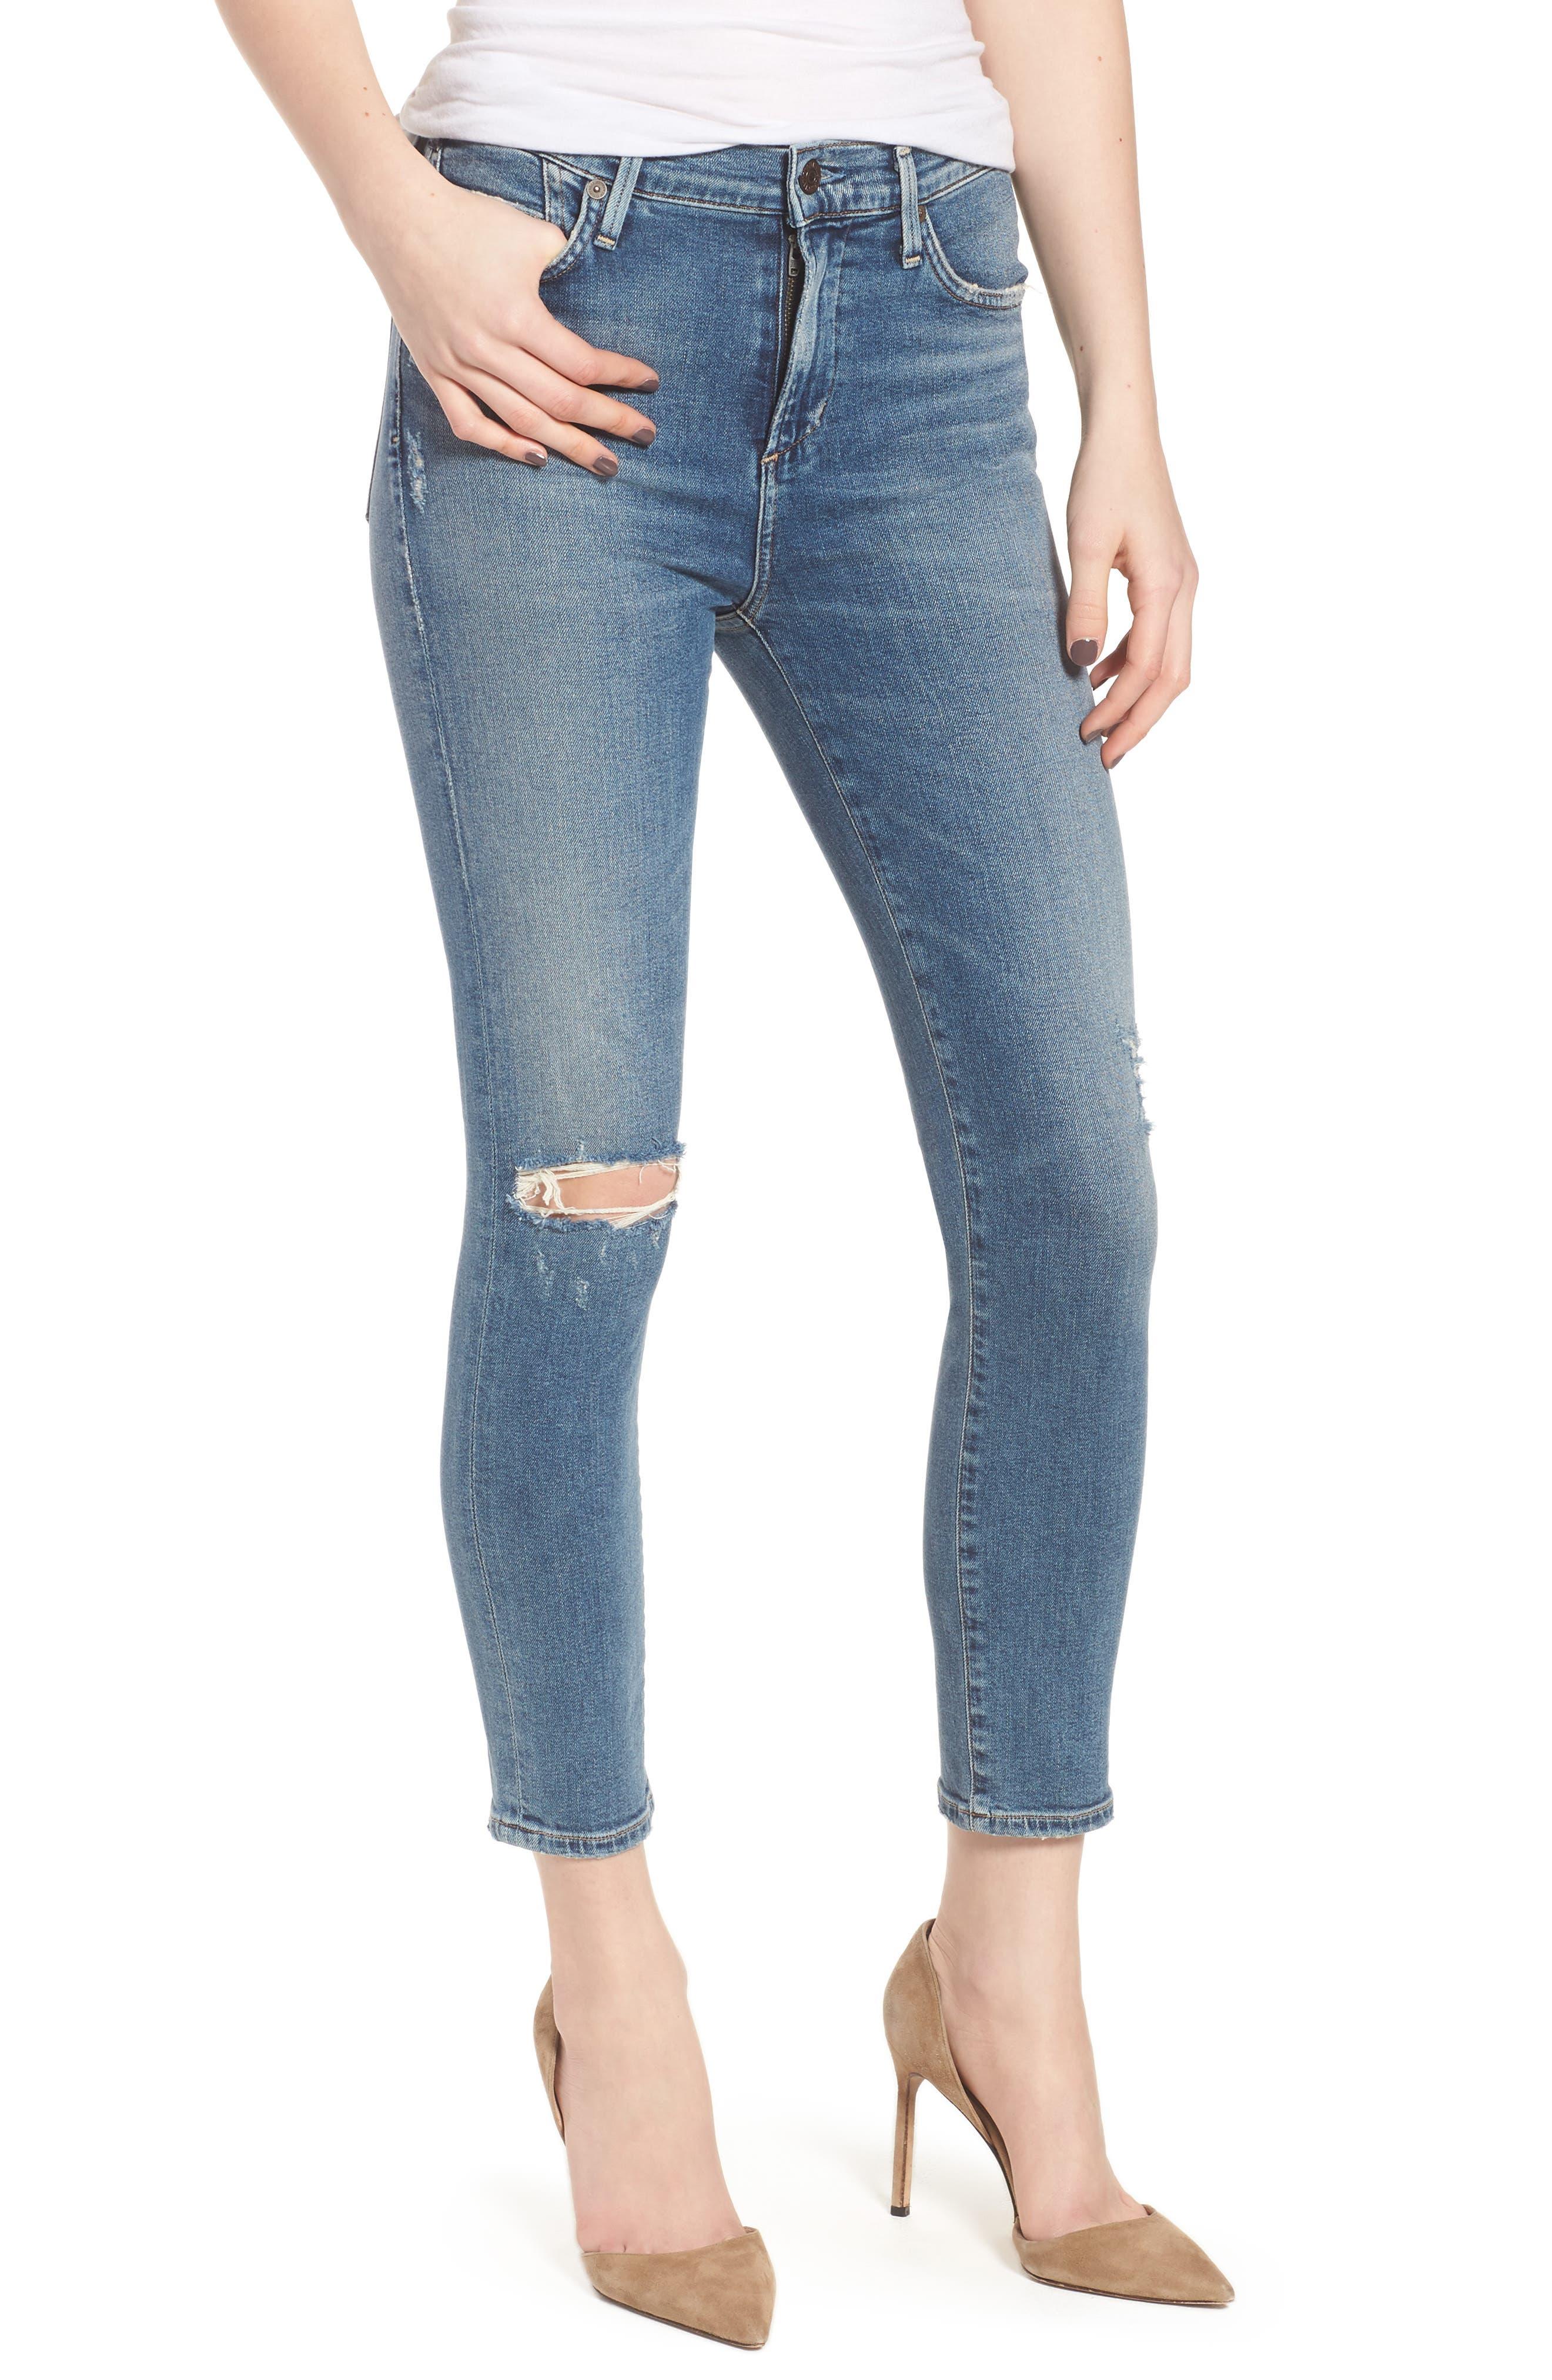 Rocket High Waist Crop Skinny Jeans,                         Main,                         color, 427